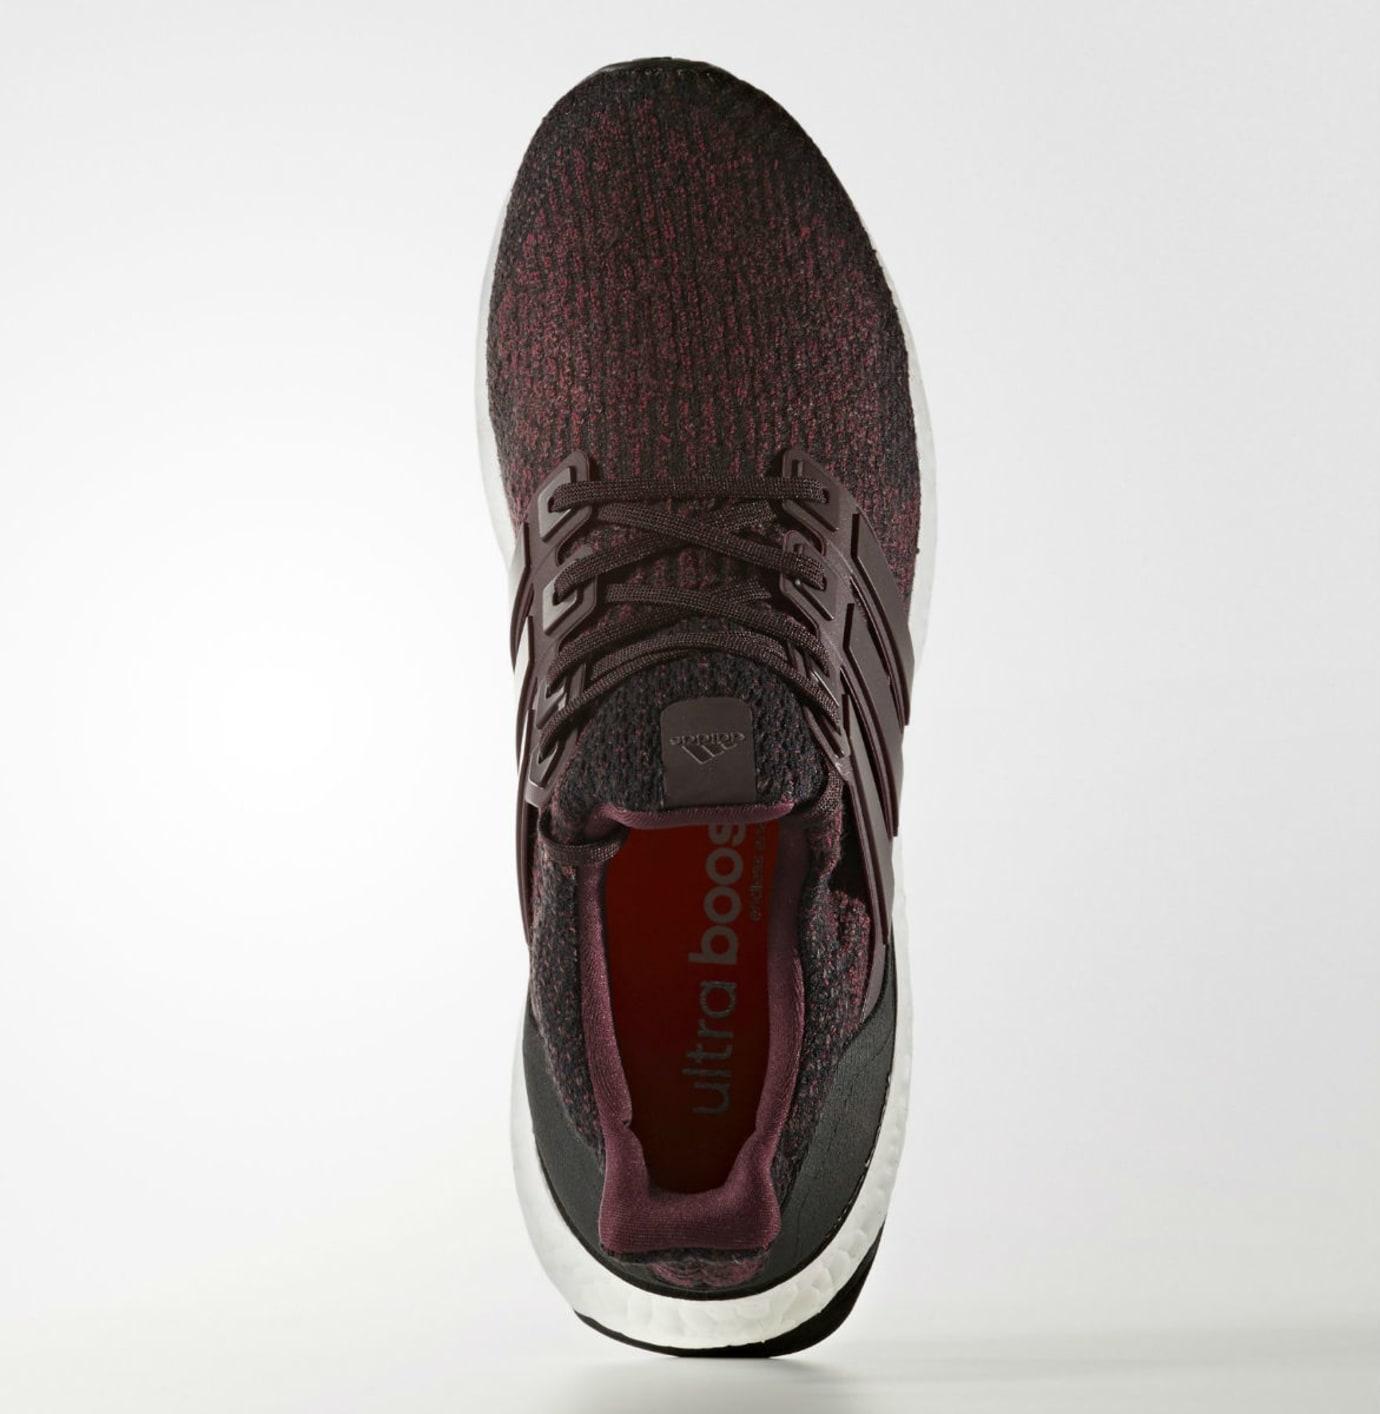 Adidas Ultra Boost 3.0 Dark Burgundy Release Date Top S80732